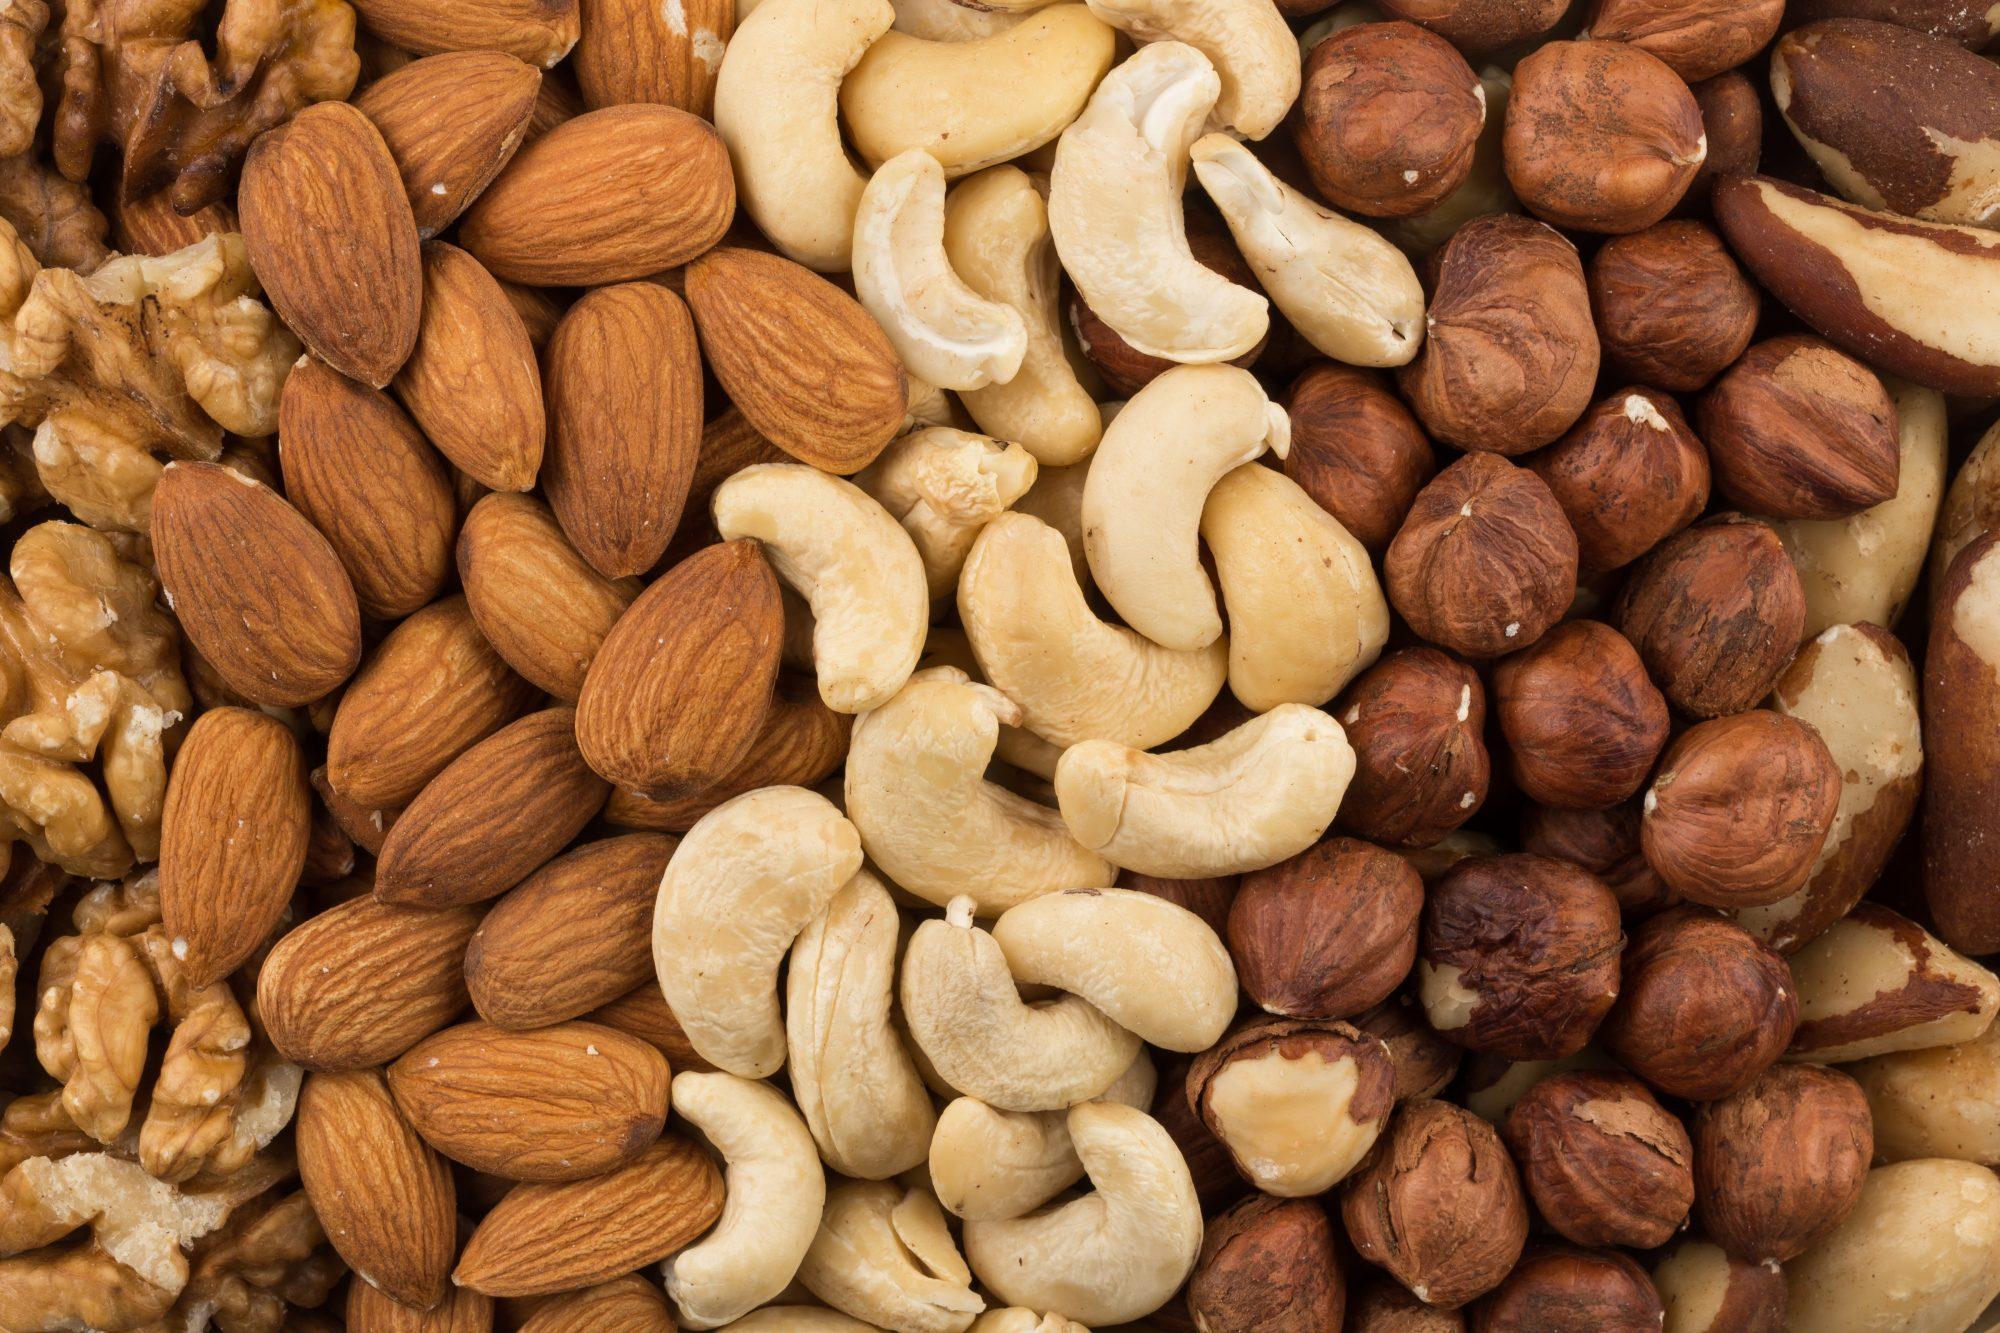 Getty 2/6/20 Nuts